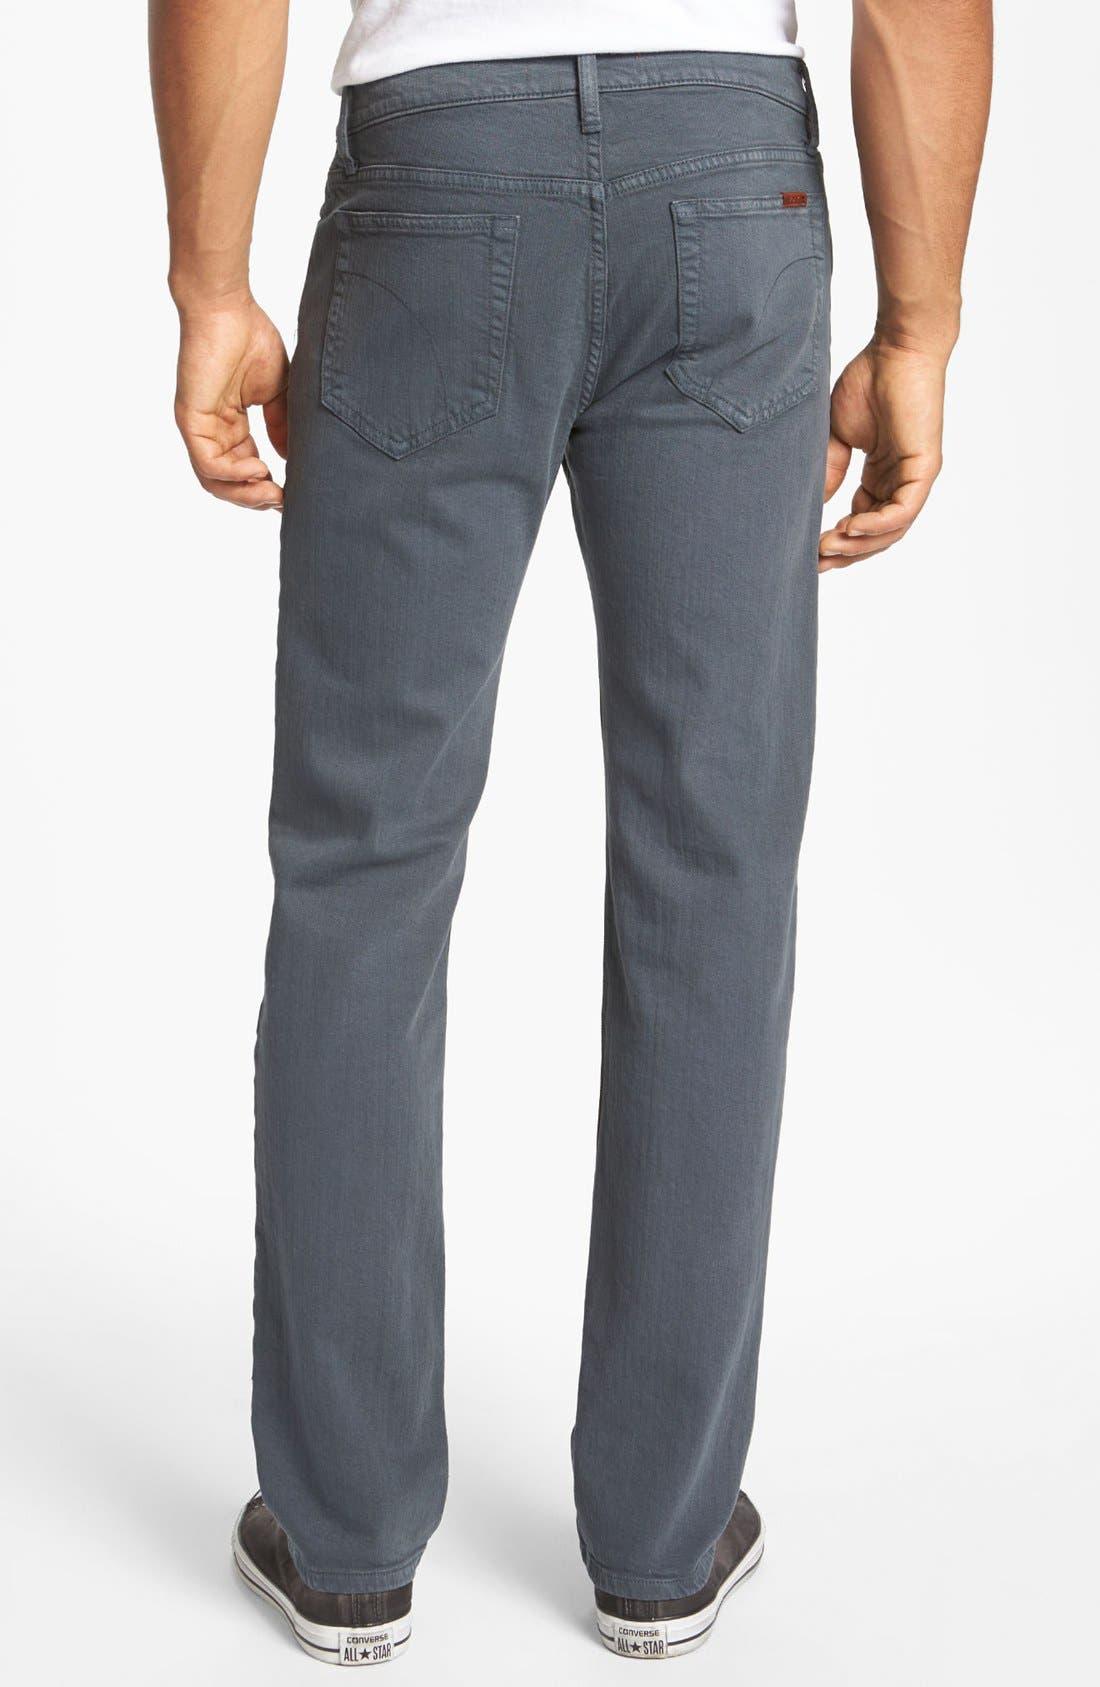 Alternate Image 1 Selected - Joe's 'Classic' Straight Leg Jeans (Asphalt)